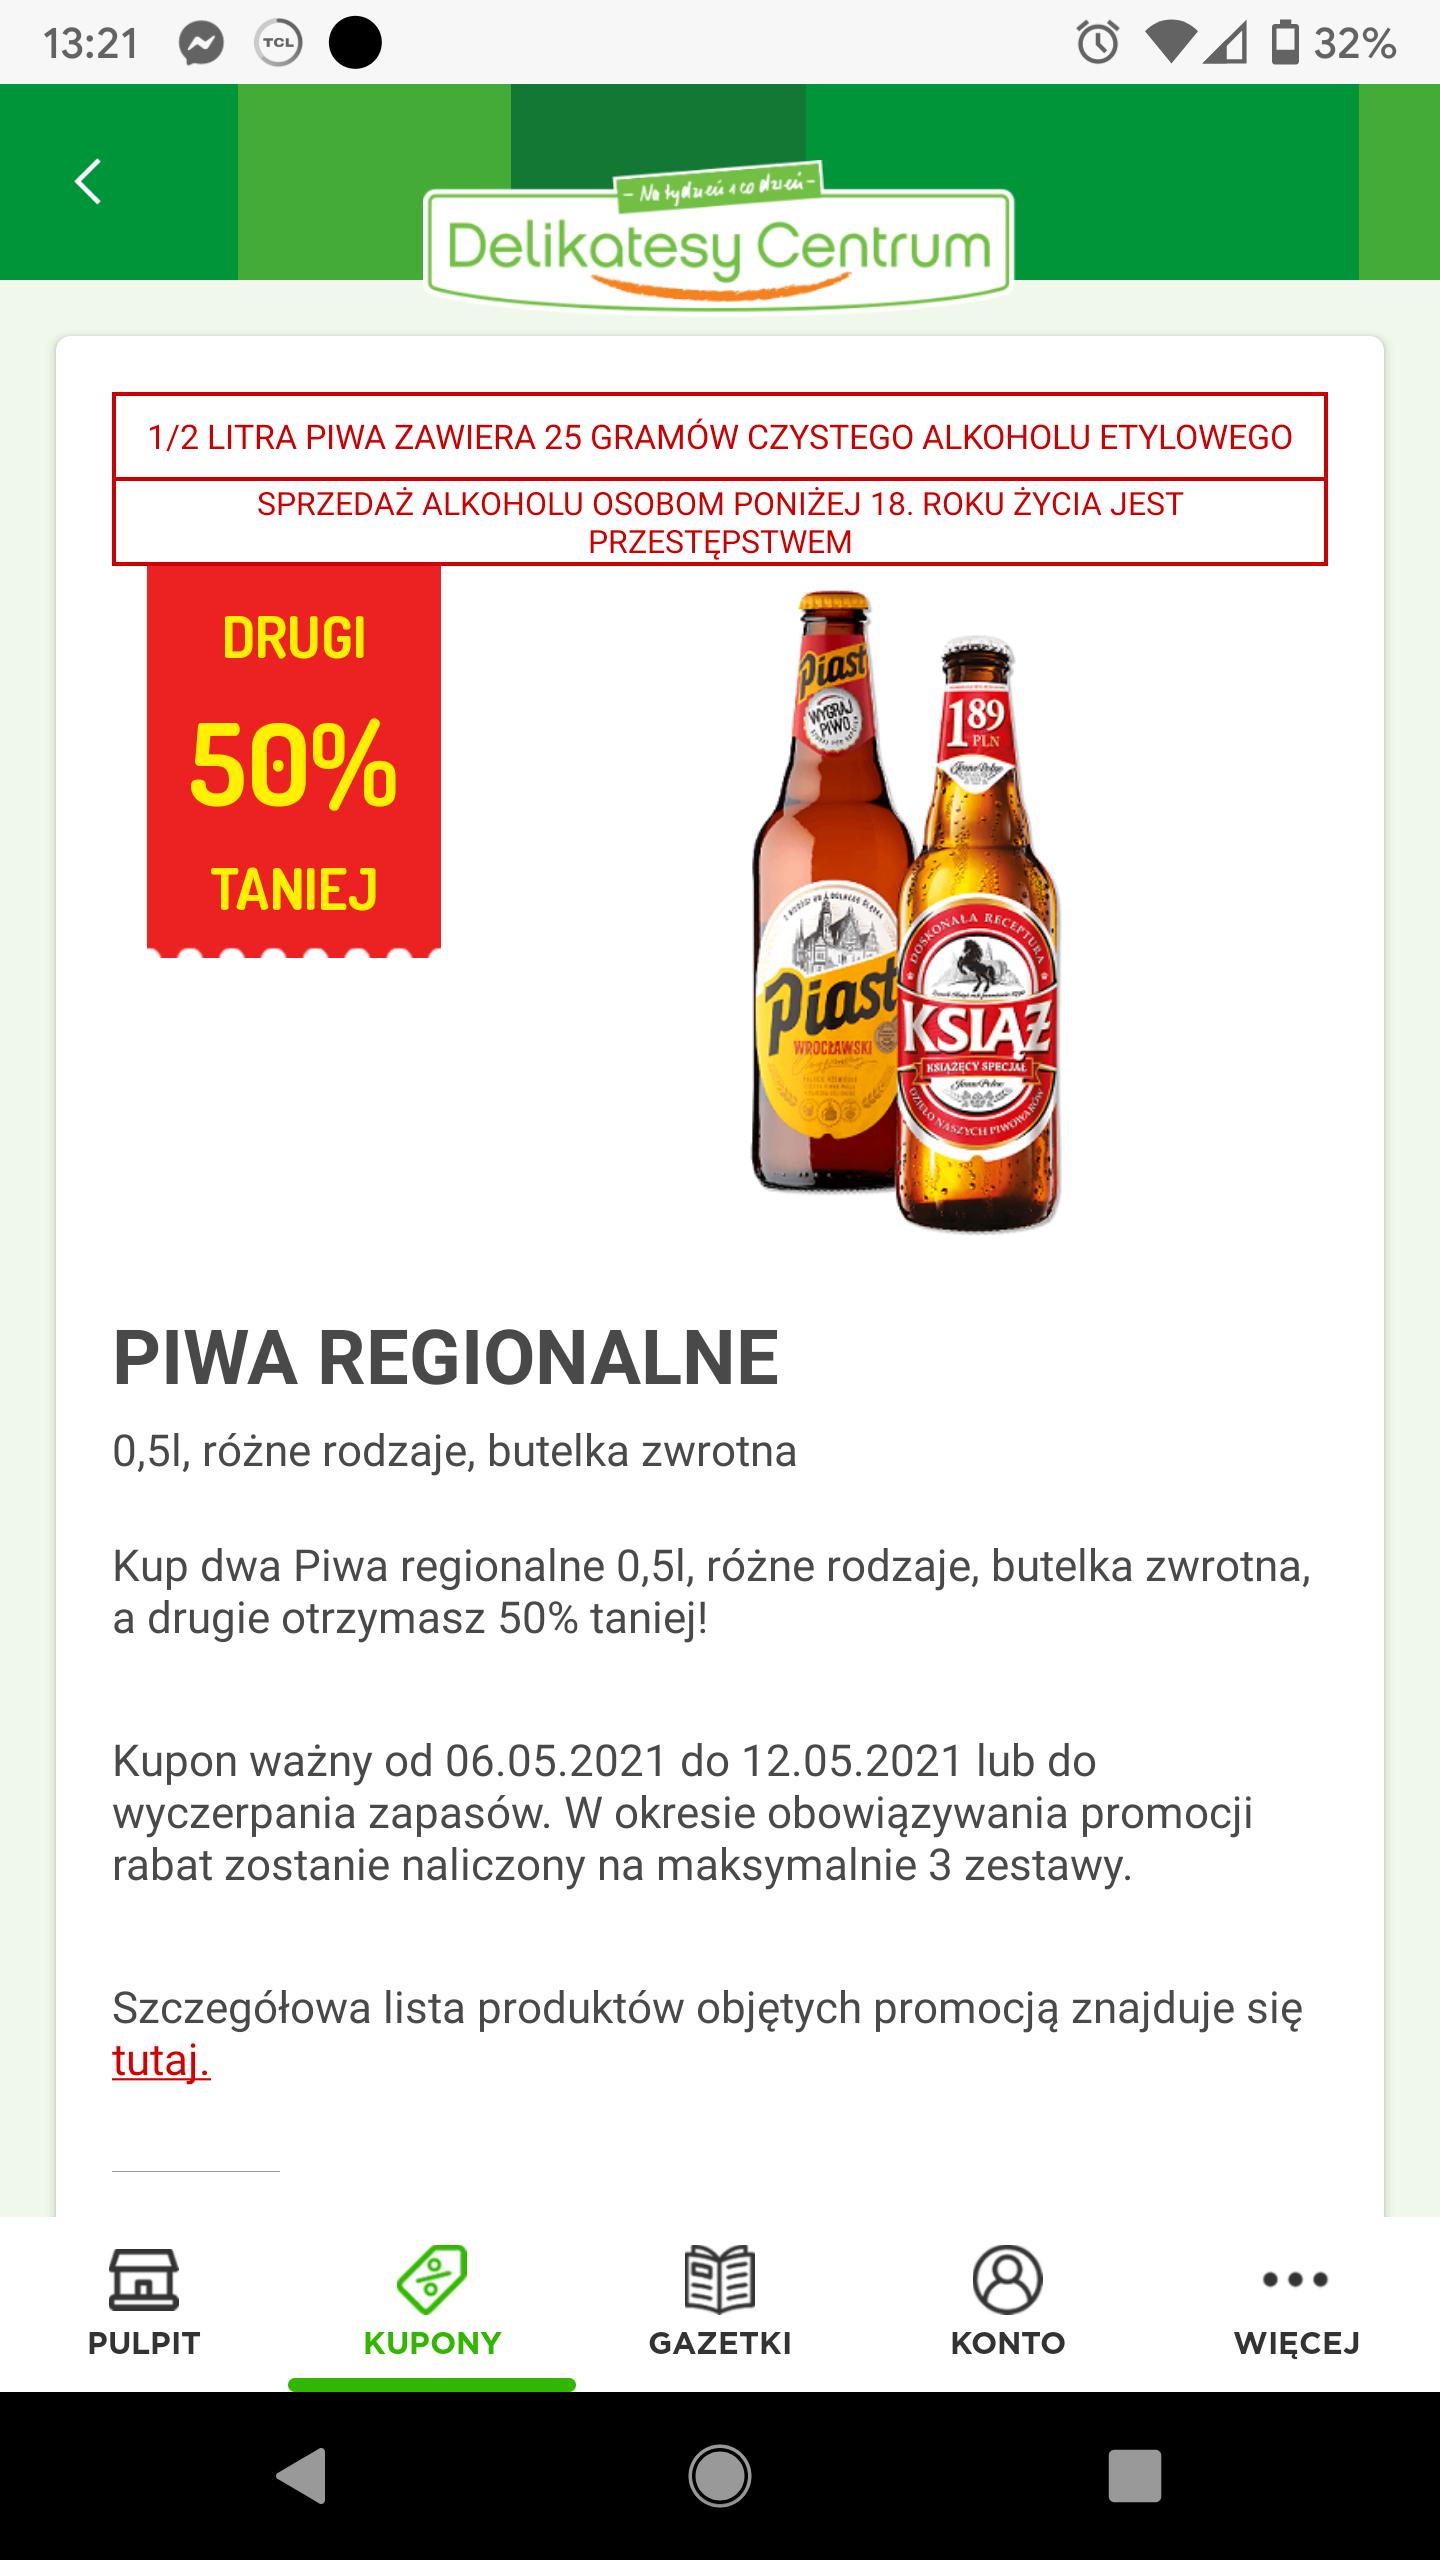 Piwa regionalne, drugie za pół ceny, delikatesy centrum